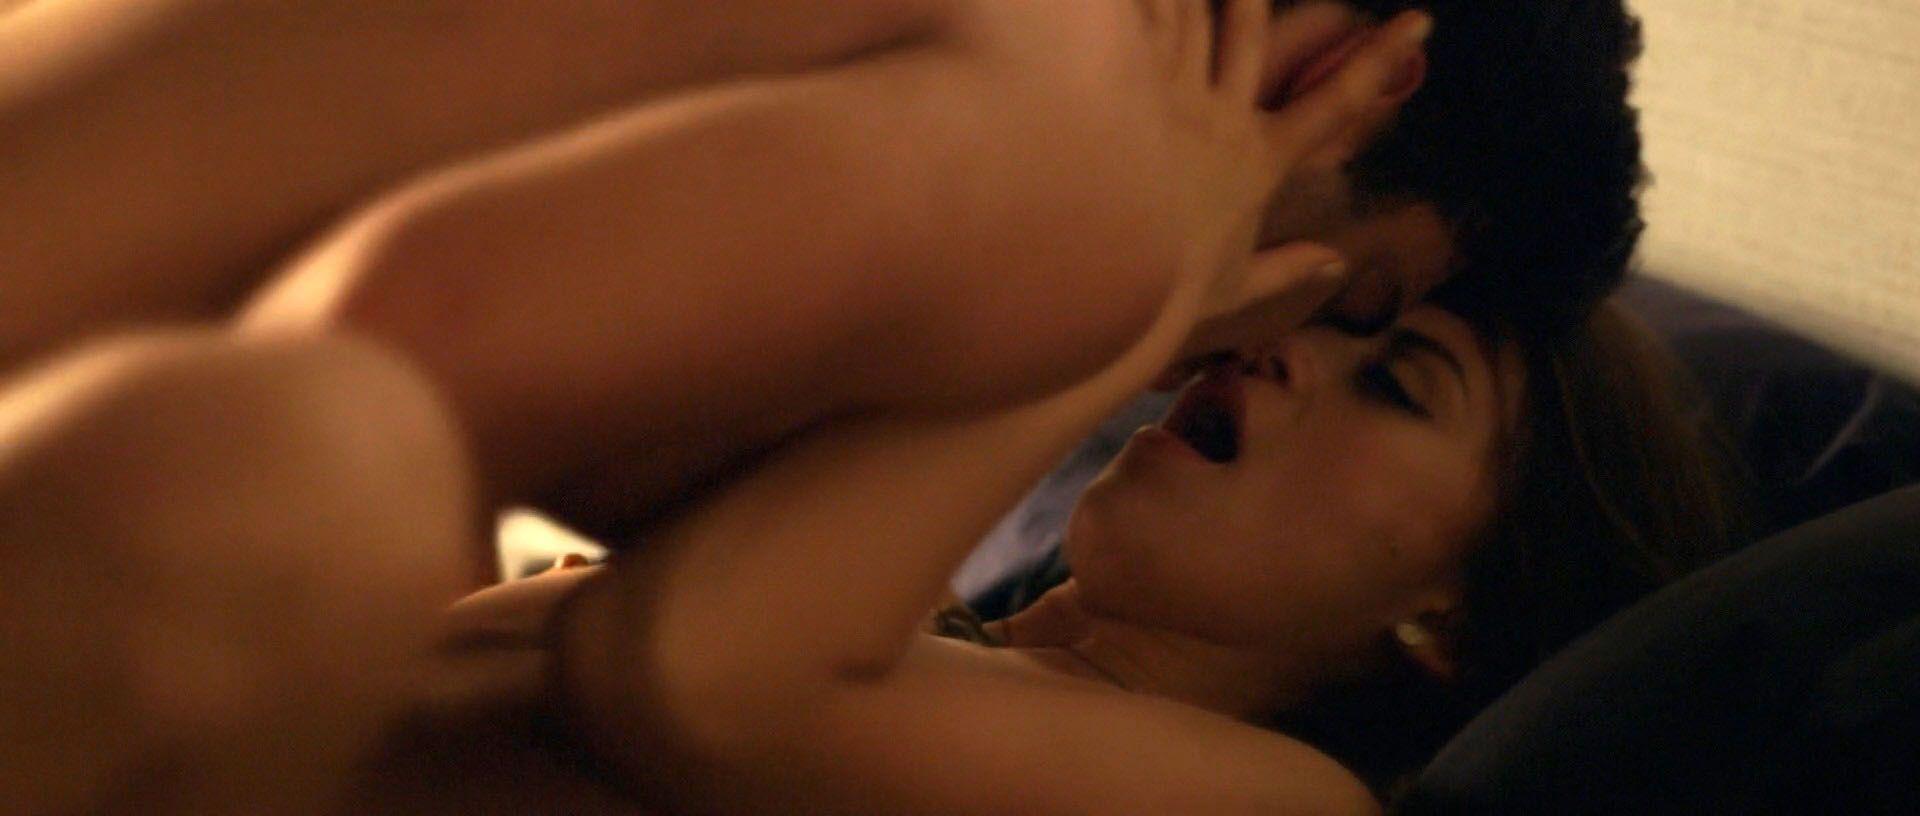 Lindsey-Shaw-Nude-1